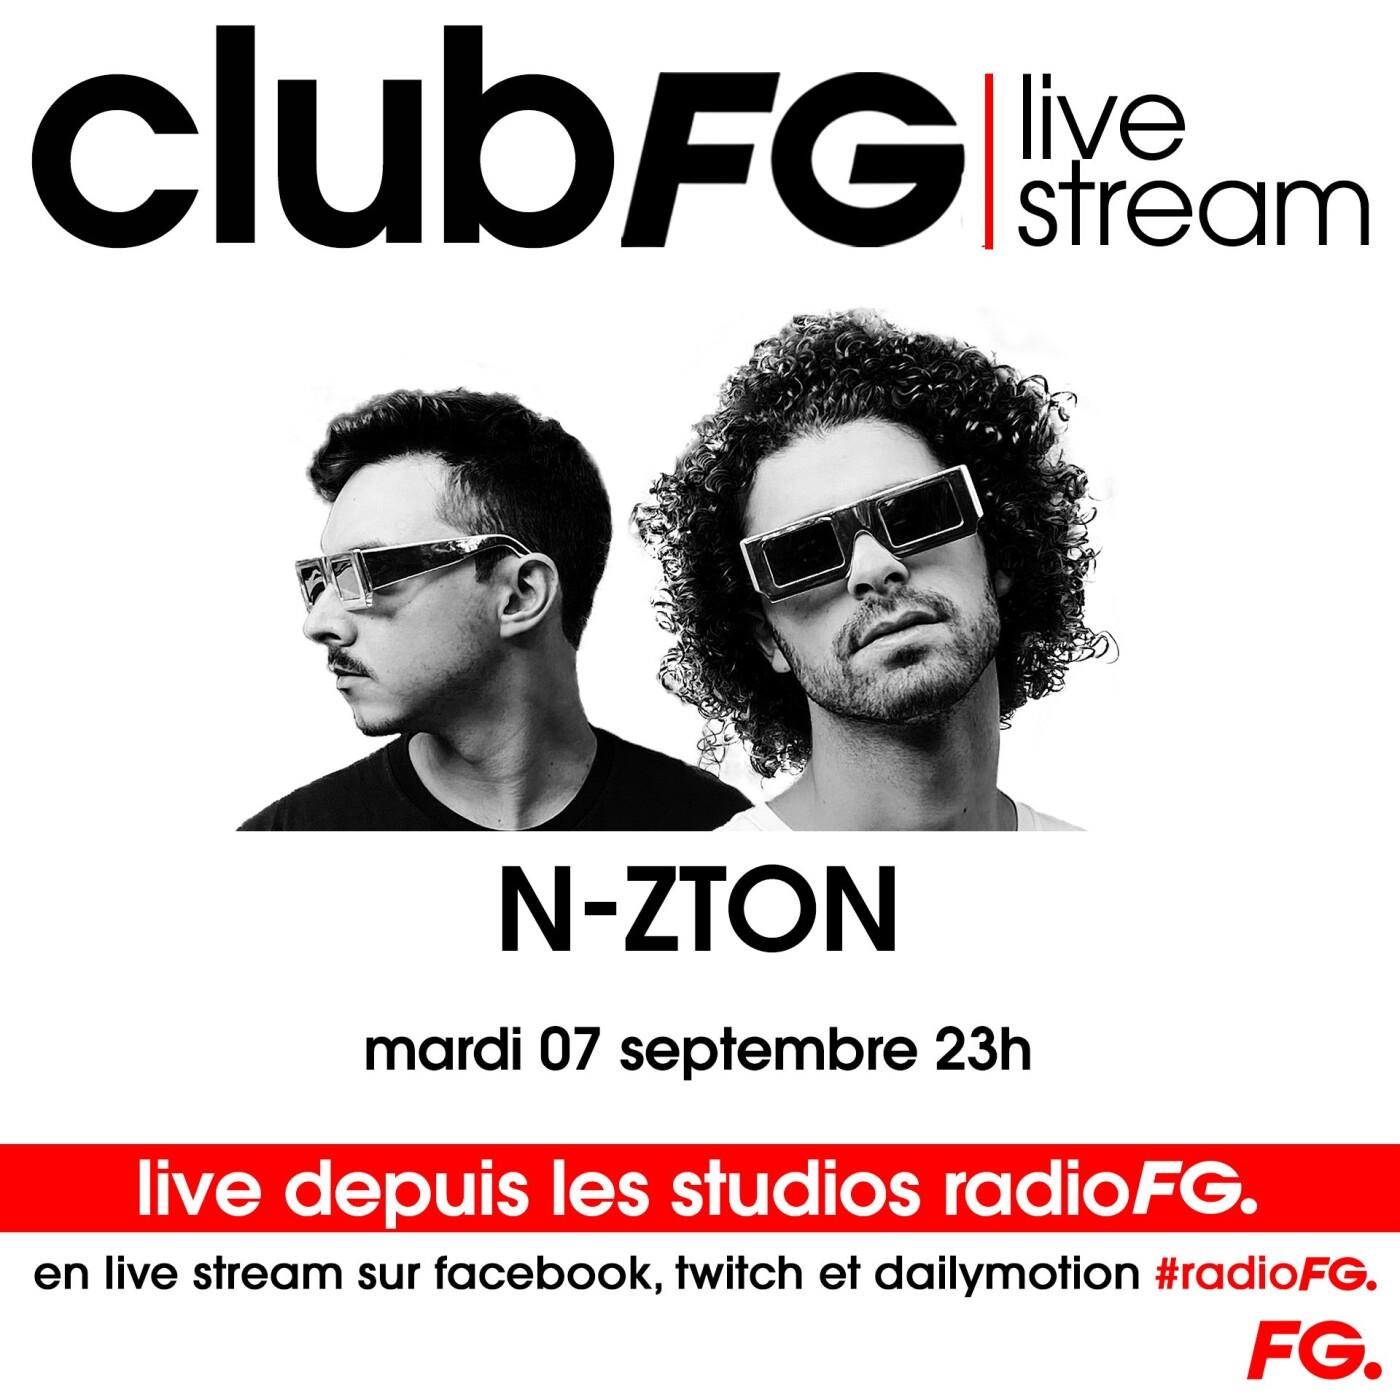 CLUB FG LIVE STREAM : N-ZTON